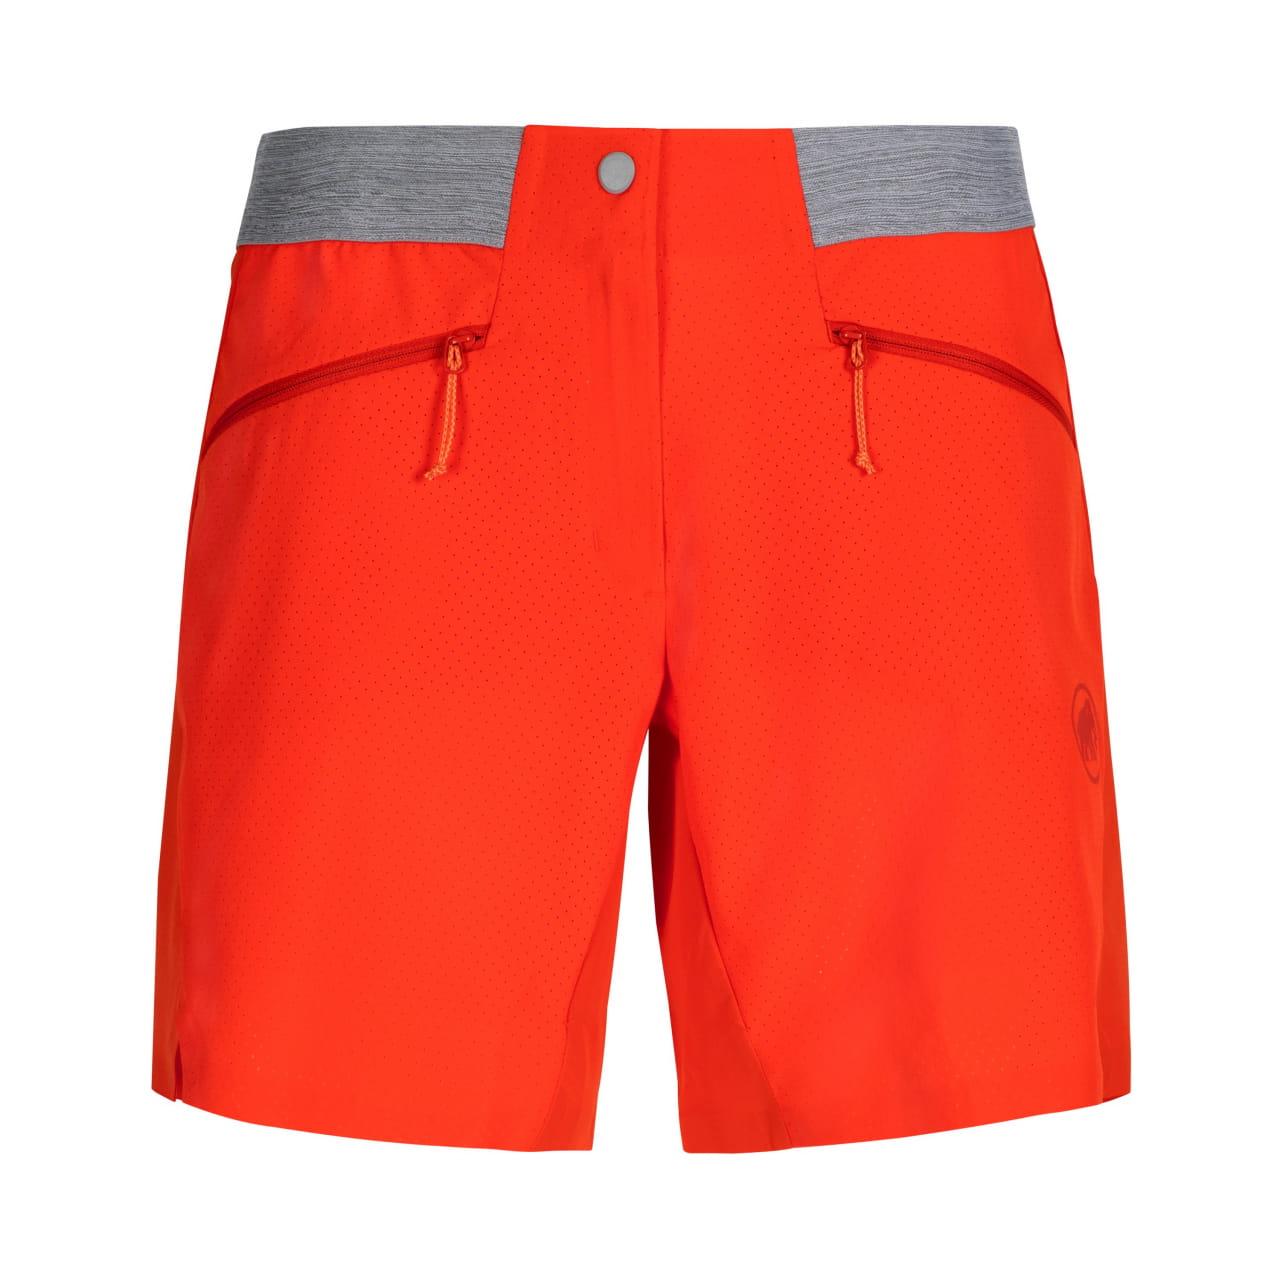 Dámské šortky Mammut Sertig Shorts Women